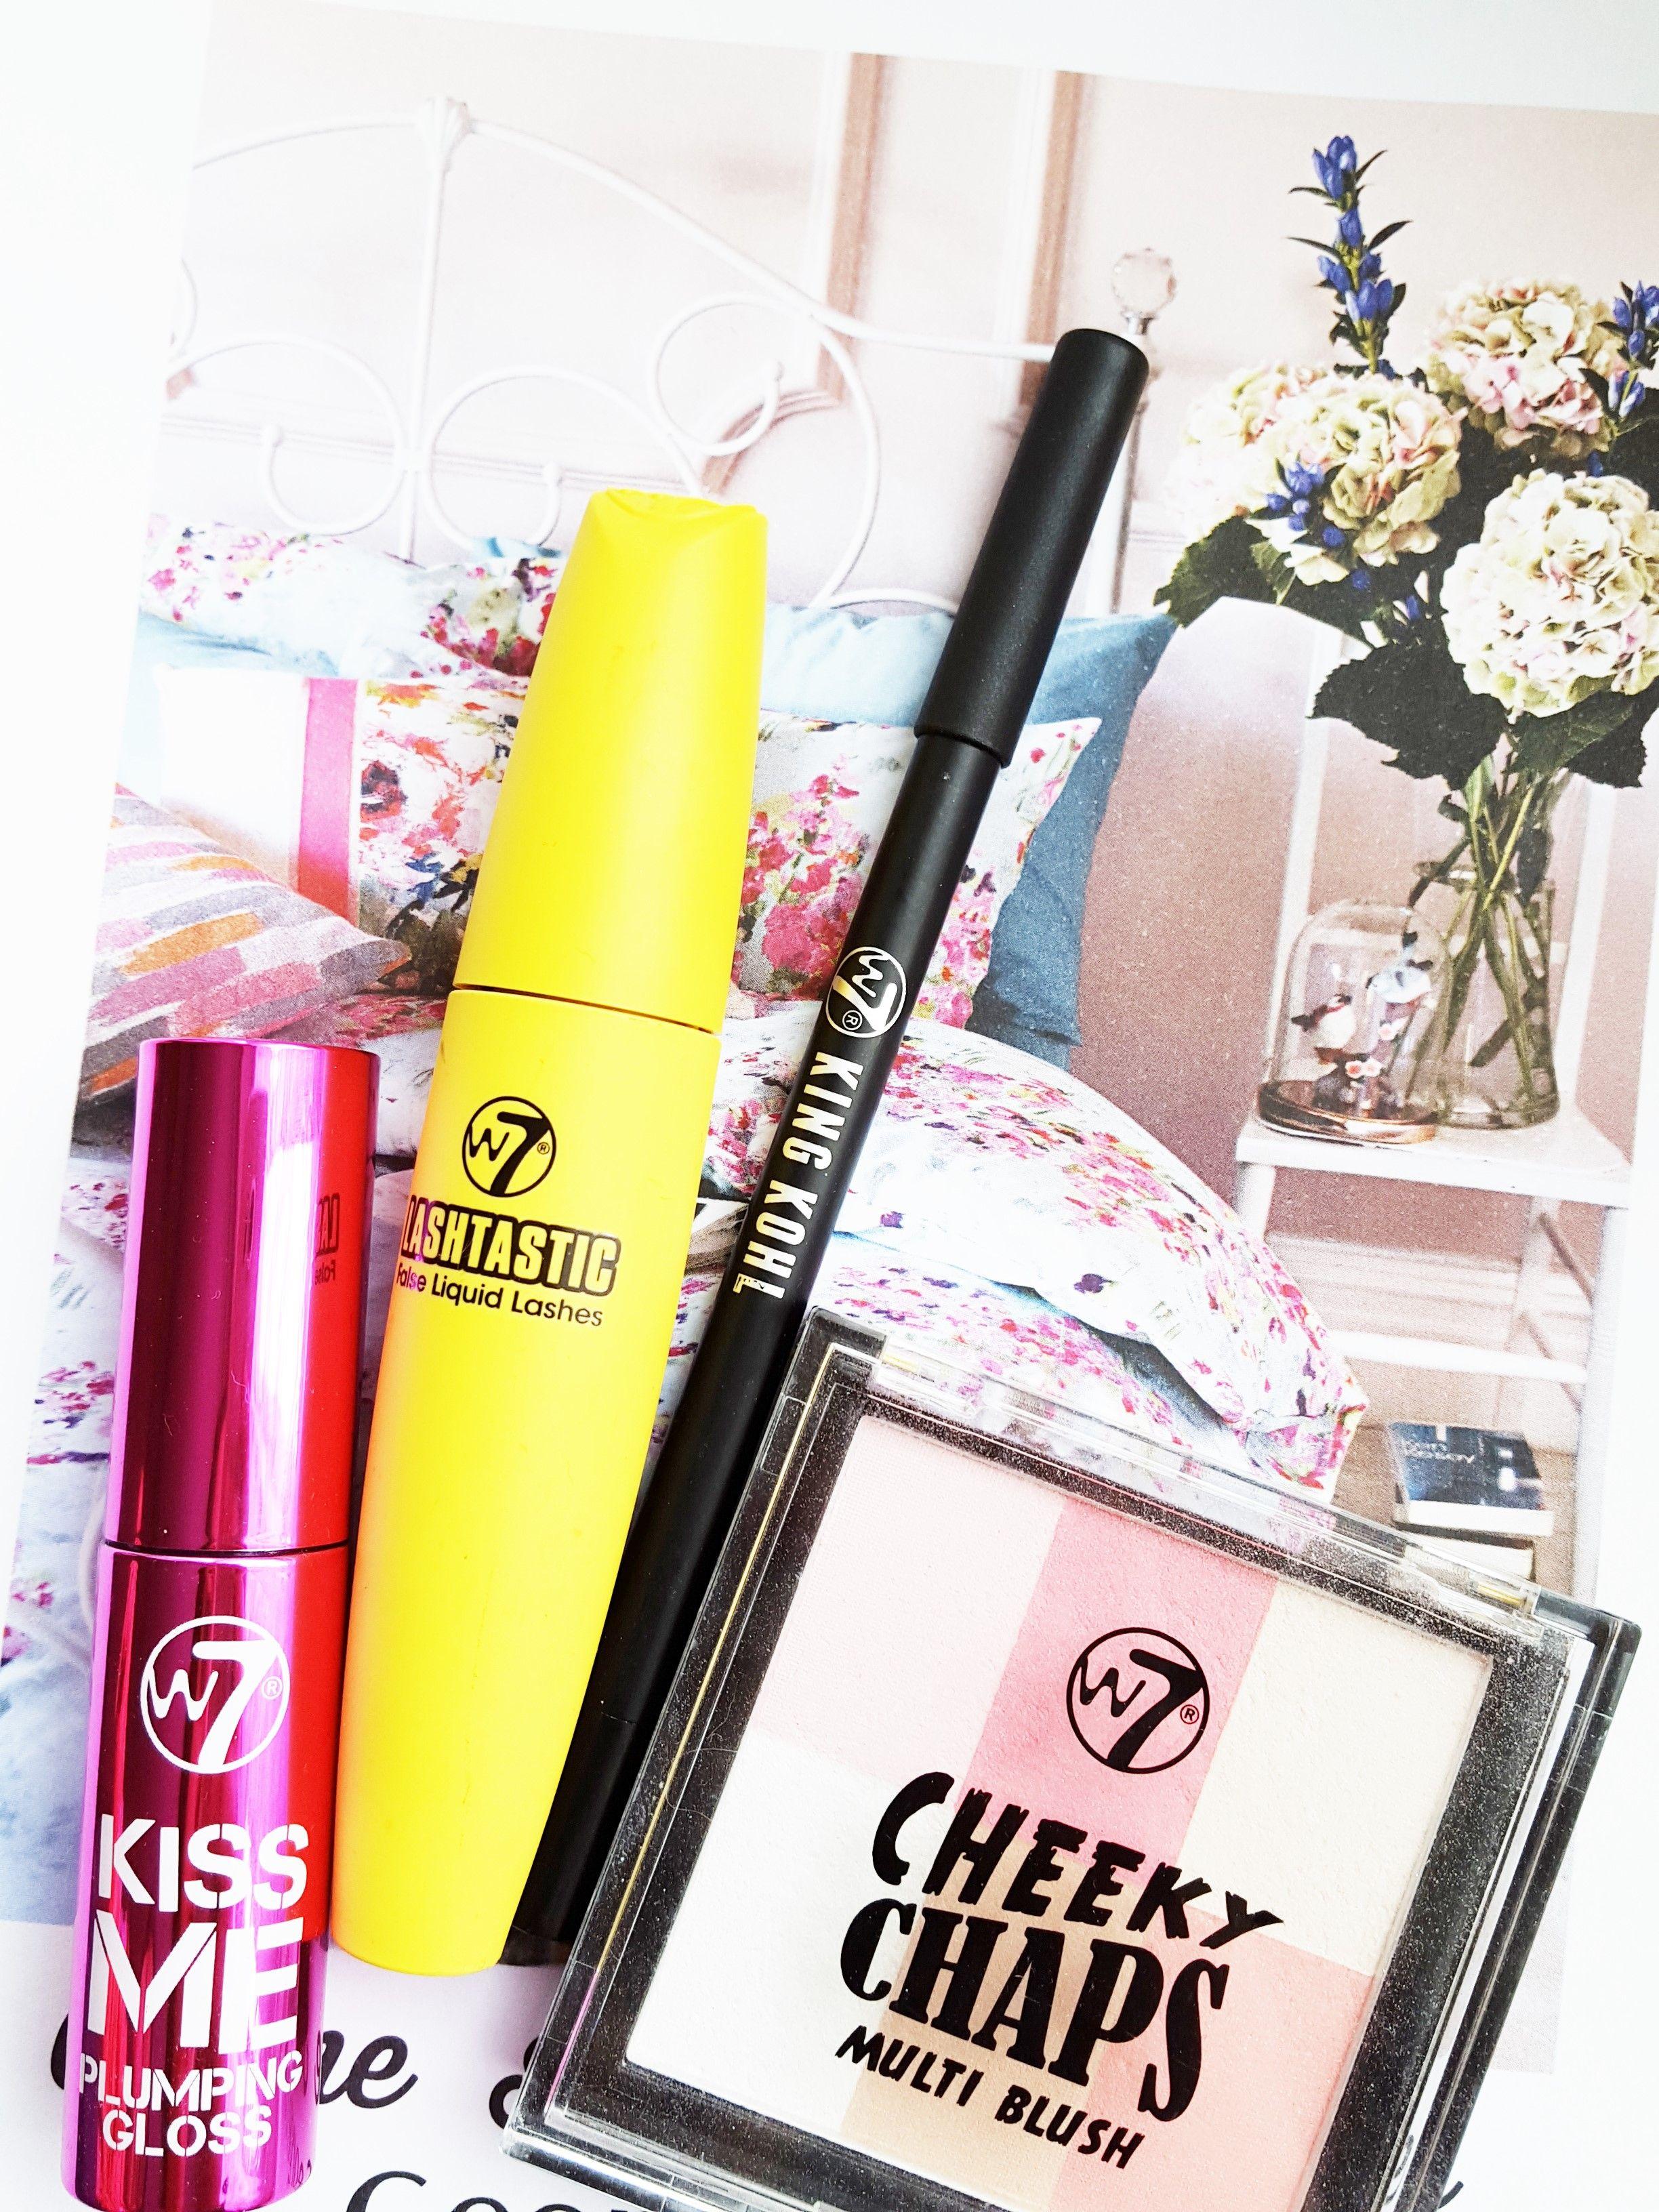 Brand Focus W7 Cosmetics W7 cosmetics, Beauty